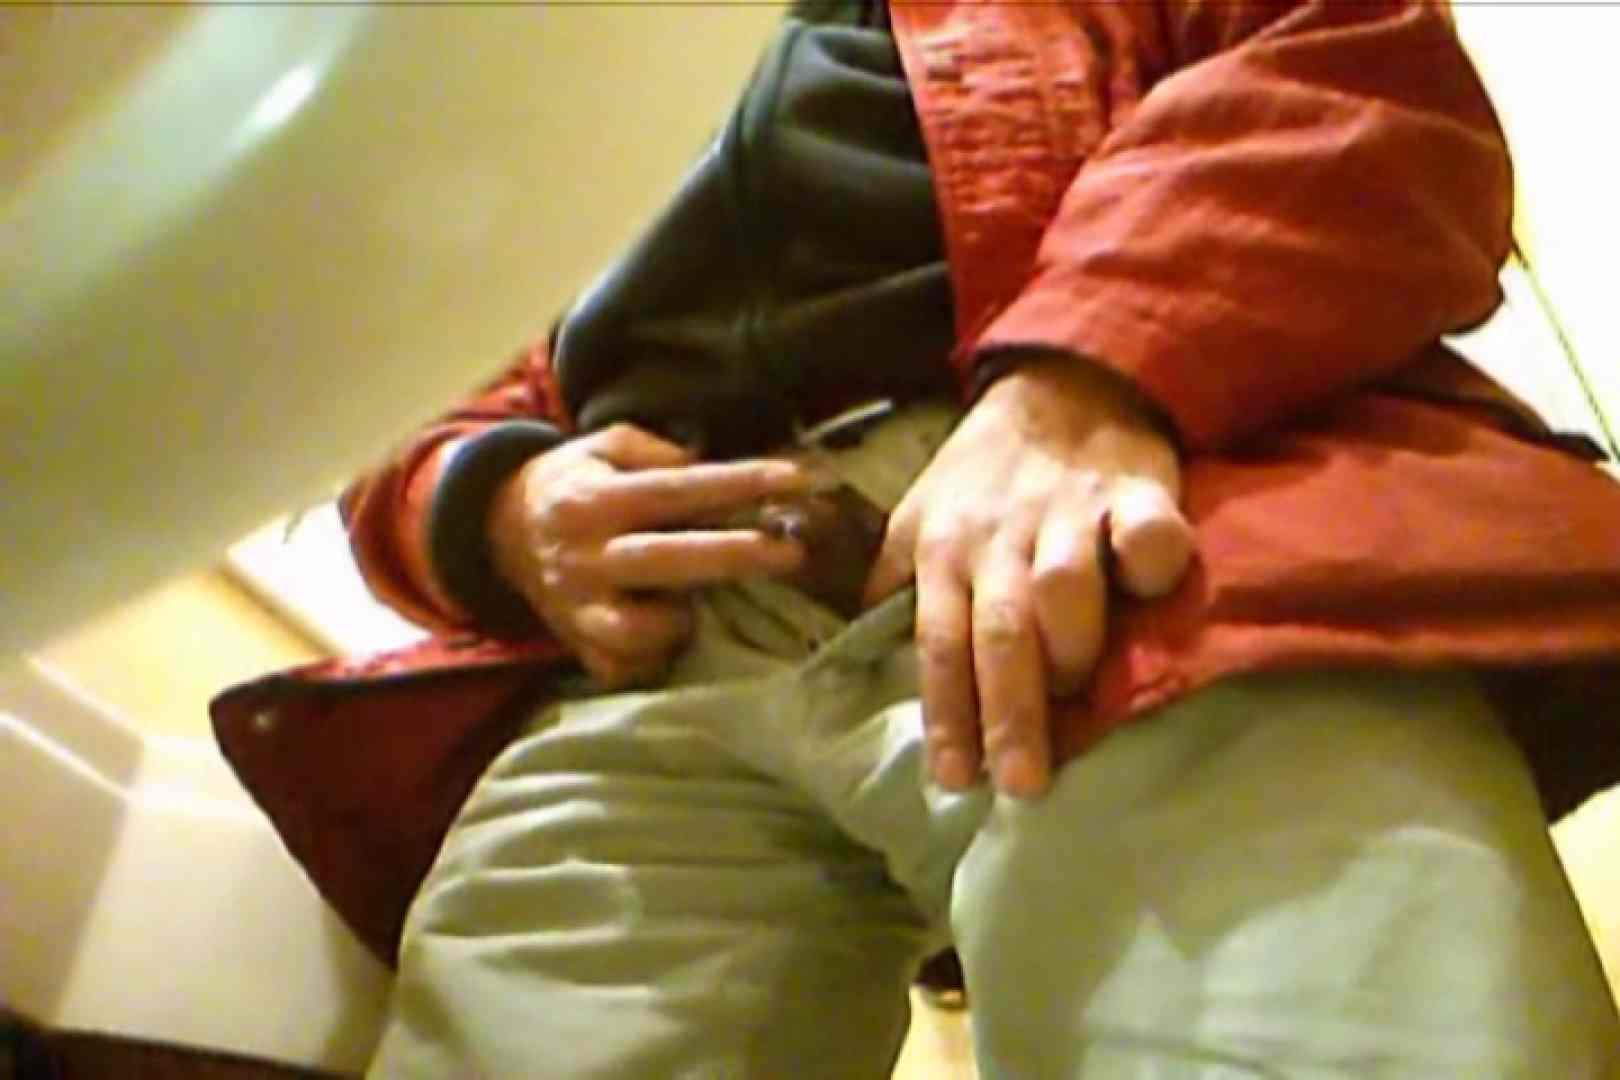 Gボーイ初投稿!掴み取りさんの洗面所覗き!in新幹線!VOL20 リーマン系ボーイズ | ボーイズ覗き  54pic 14